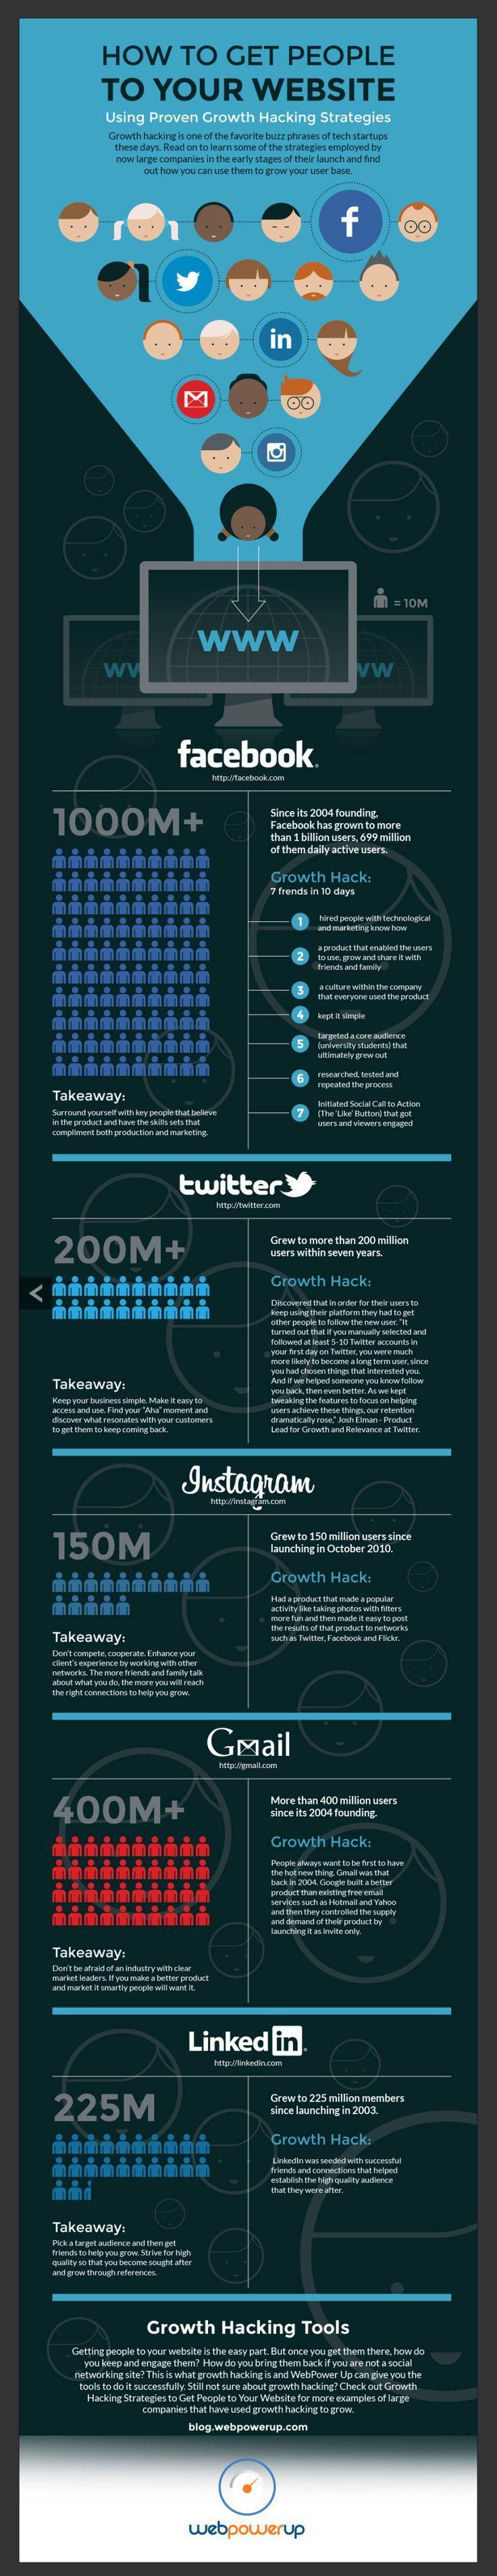 How to get people to your website #socialMedia FREE Marketing Training - http://simplicitymarketingllc.com/bizcamp